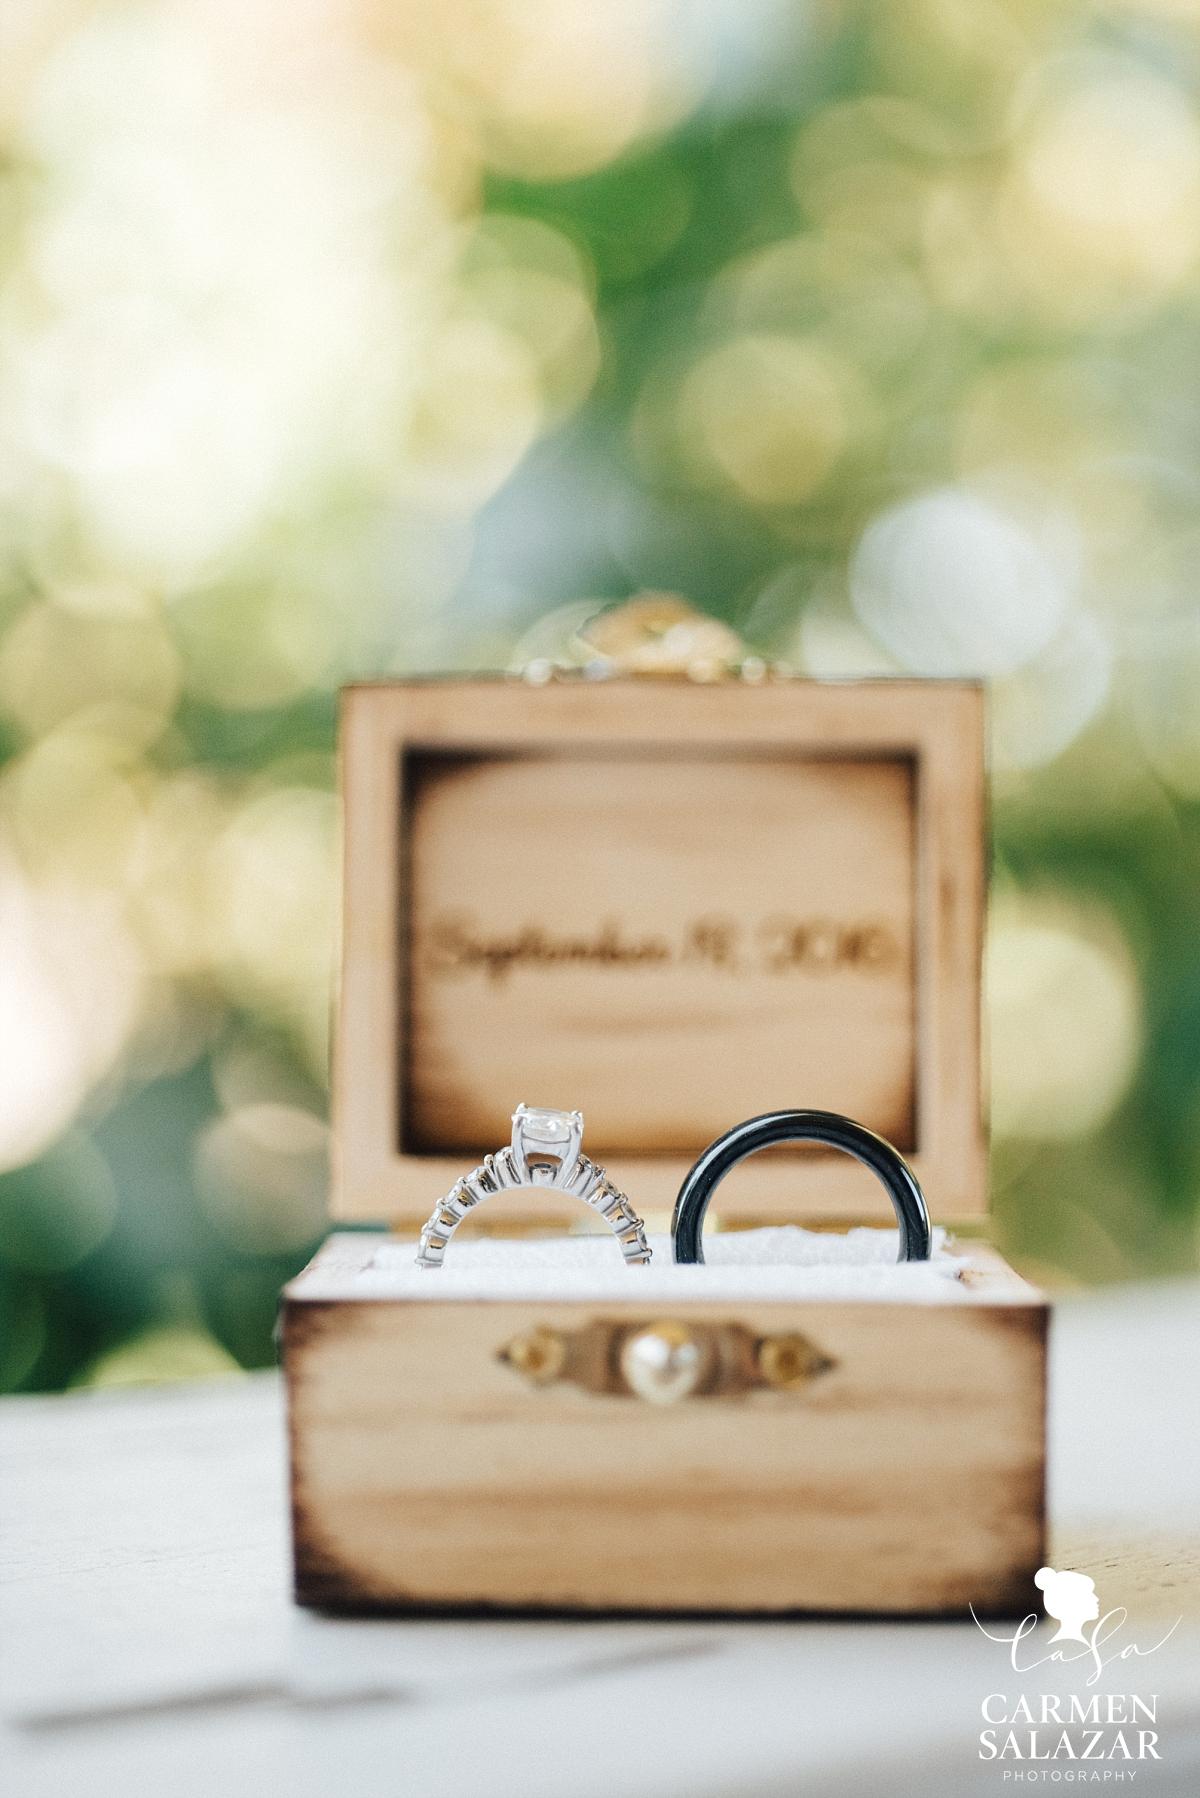 Modern wedding rings in personalized wood ring box - Carmen Salazar